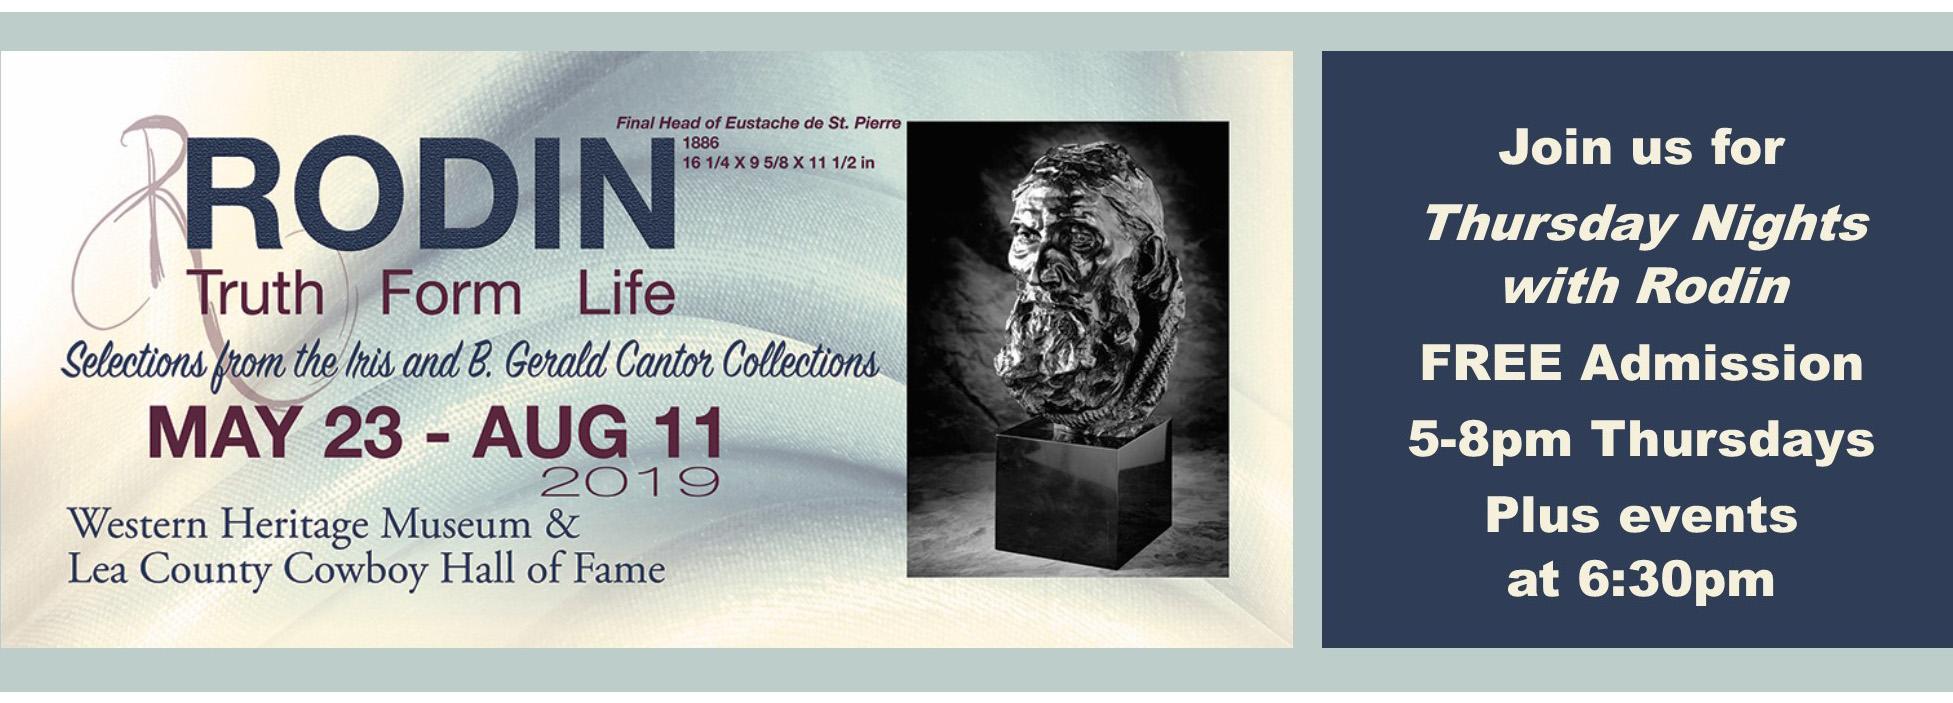 Rodin: Truth - Form - Life